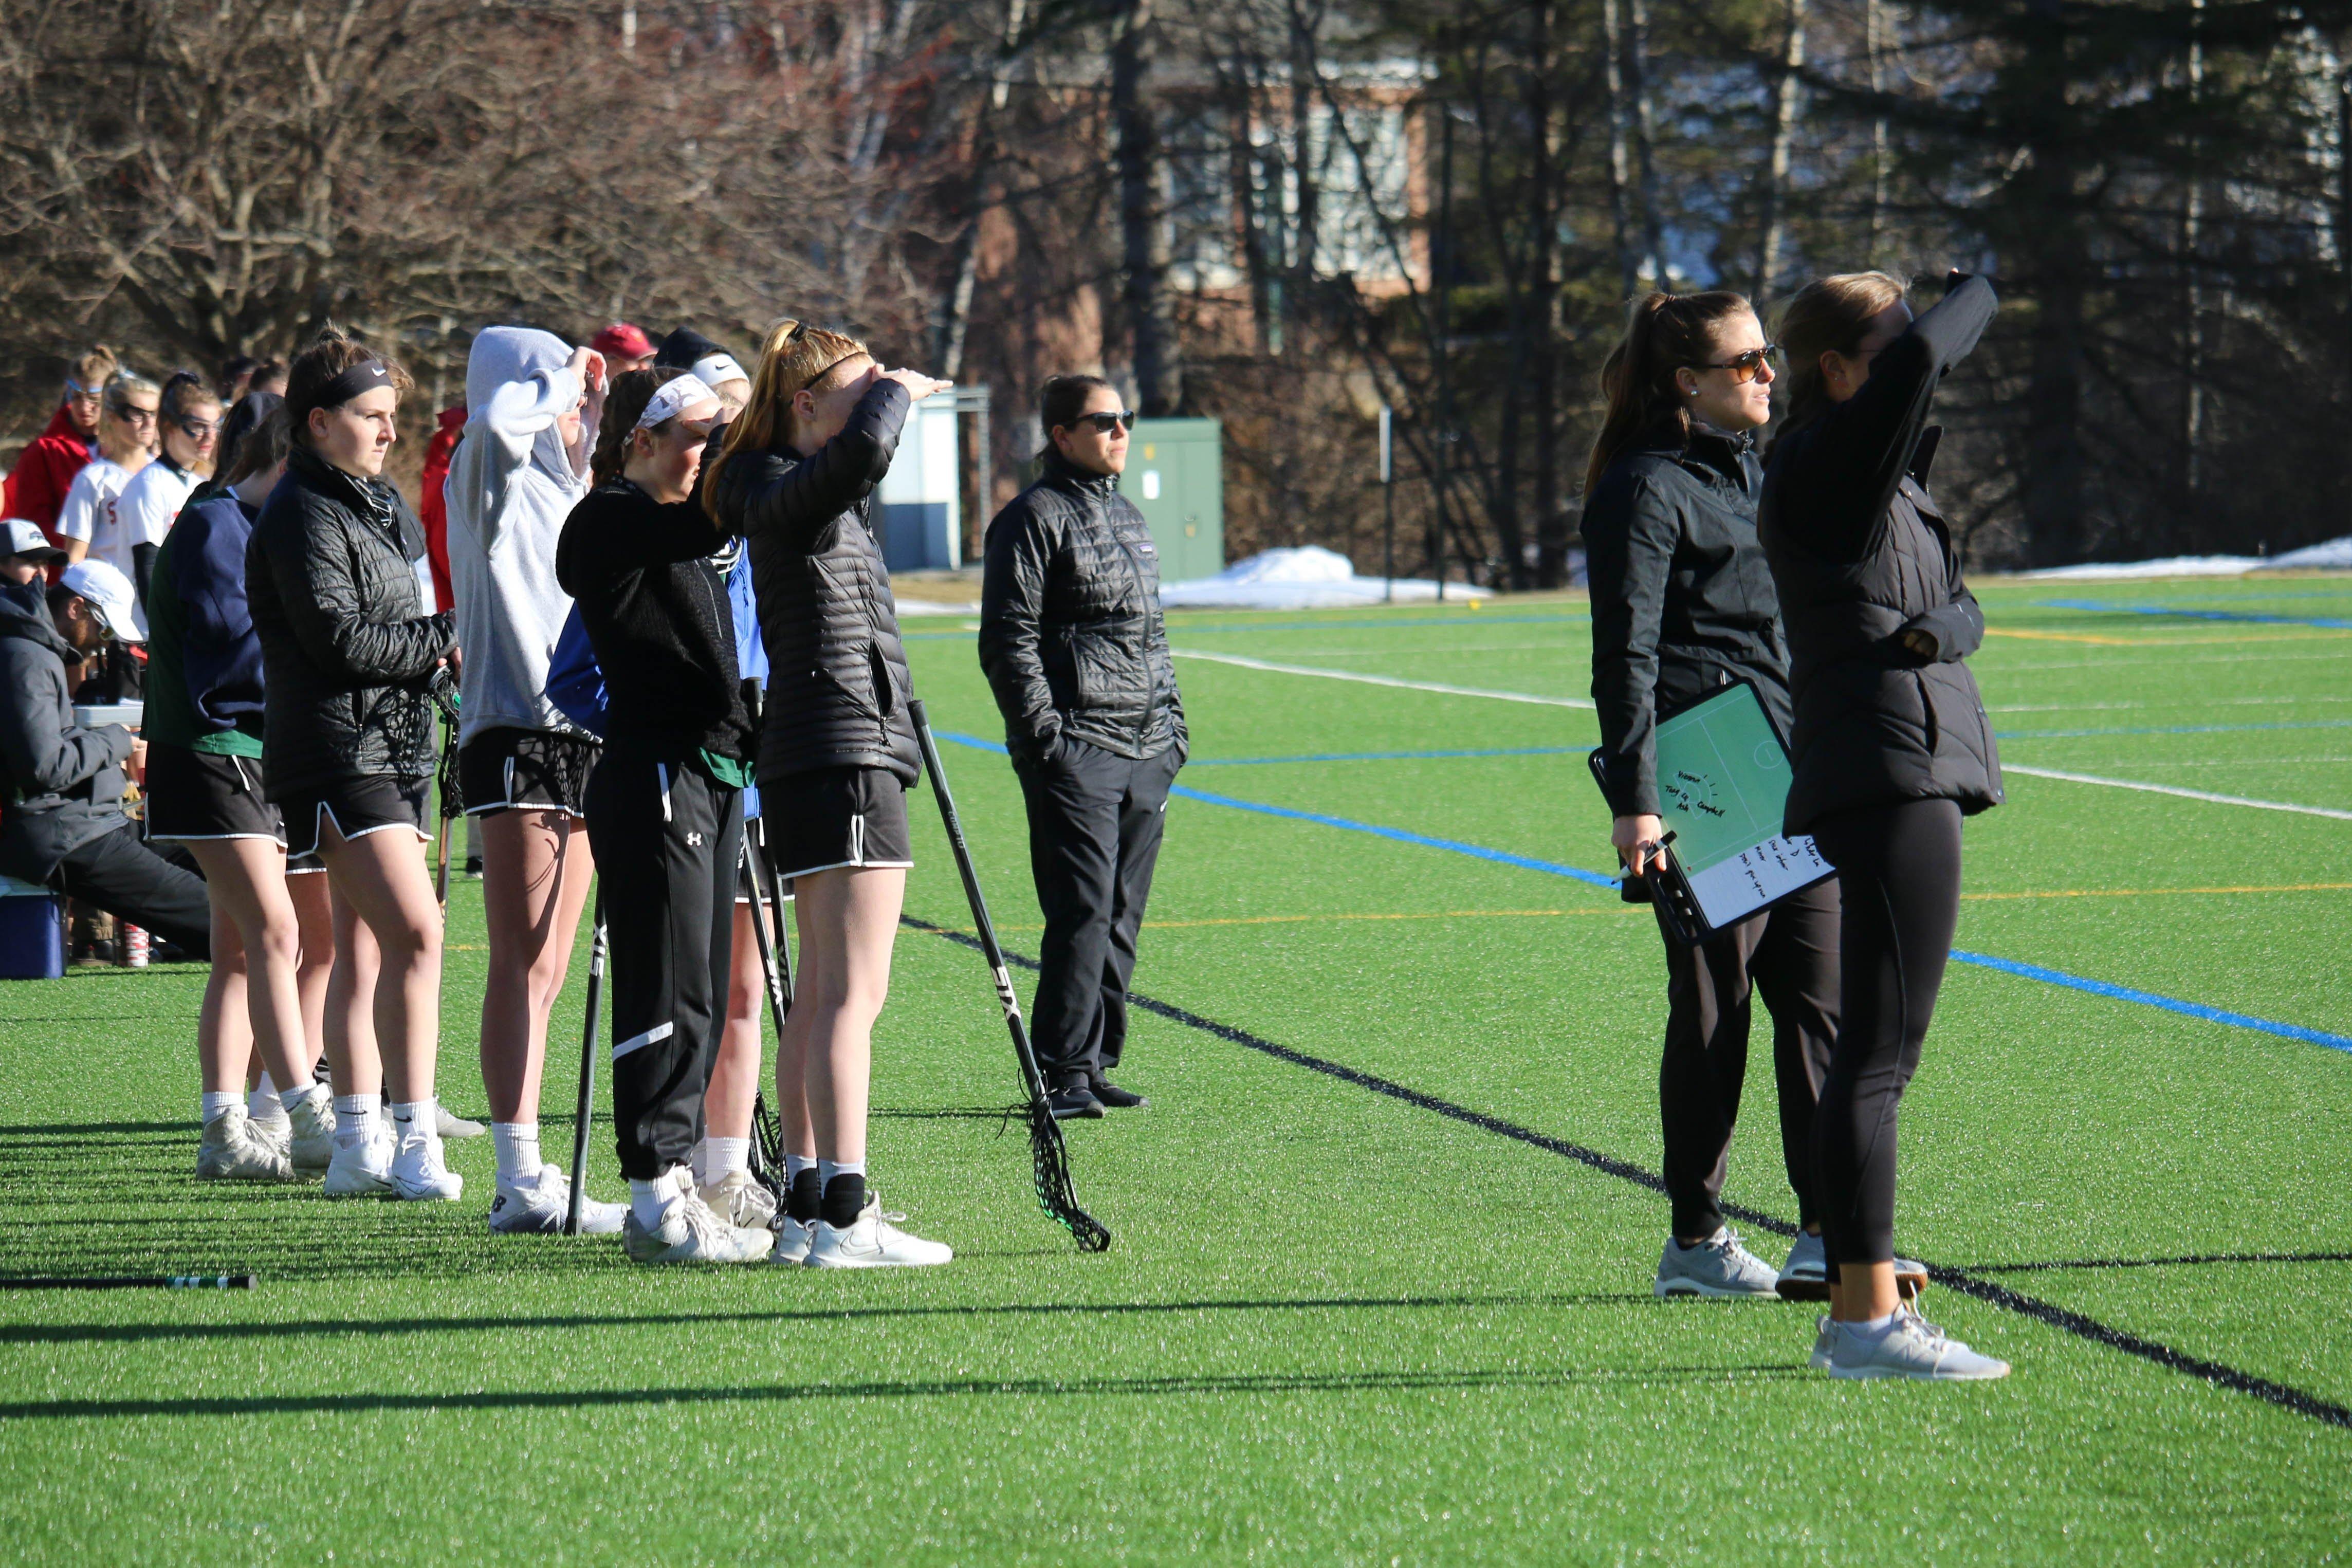 Proctor Academy Athletics Girls Lacrosse